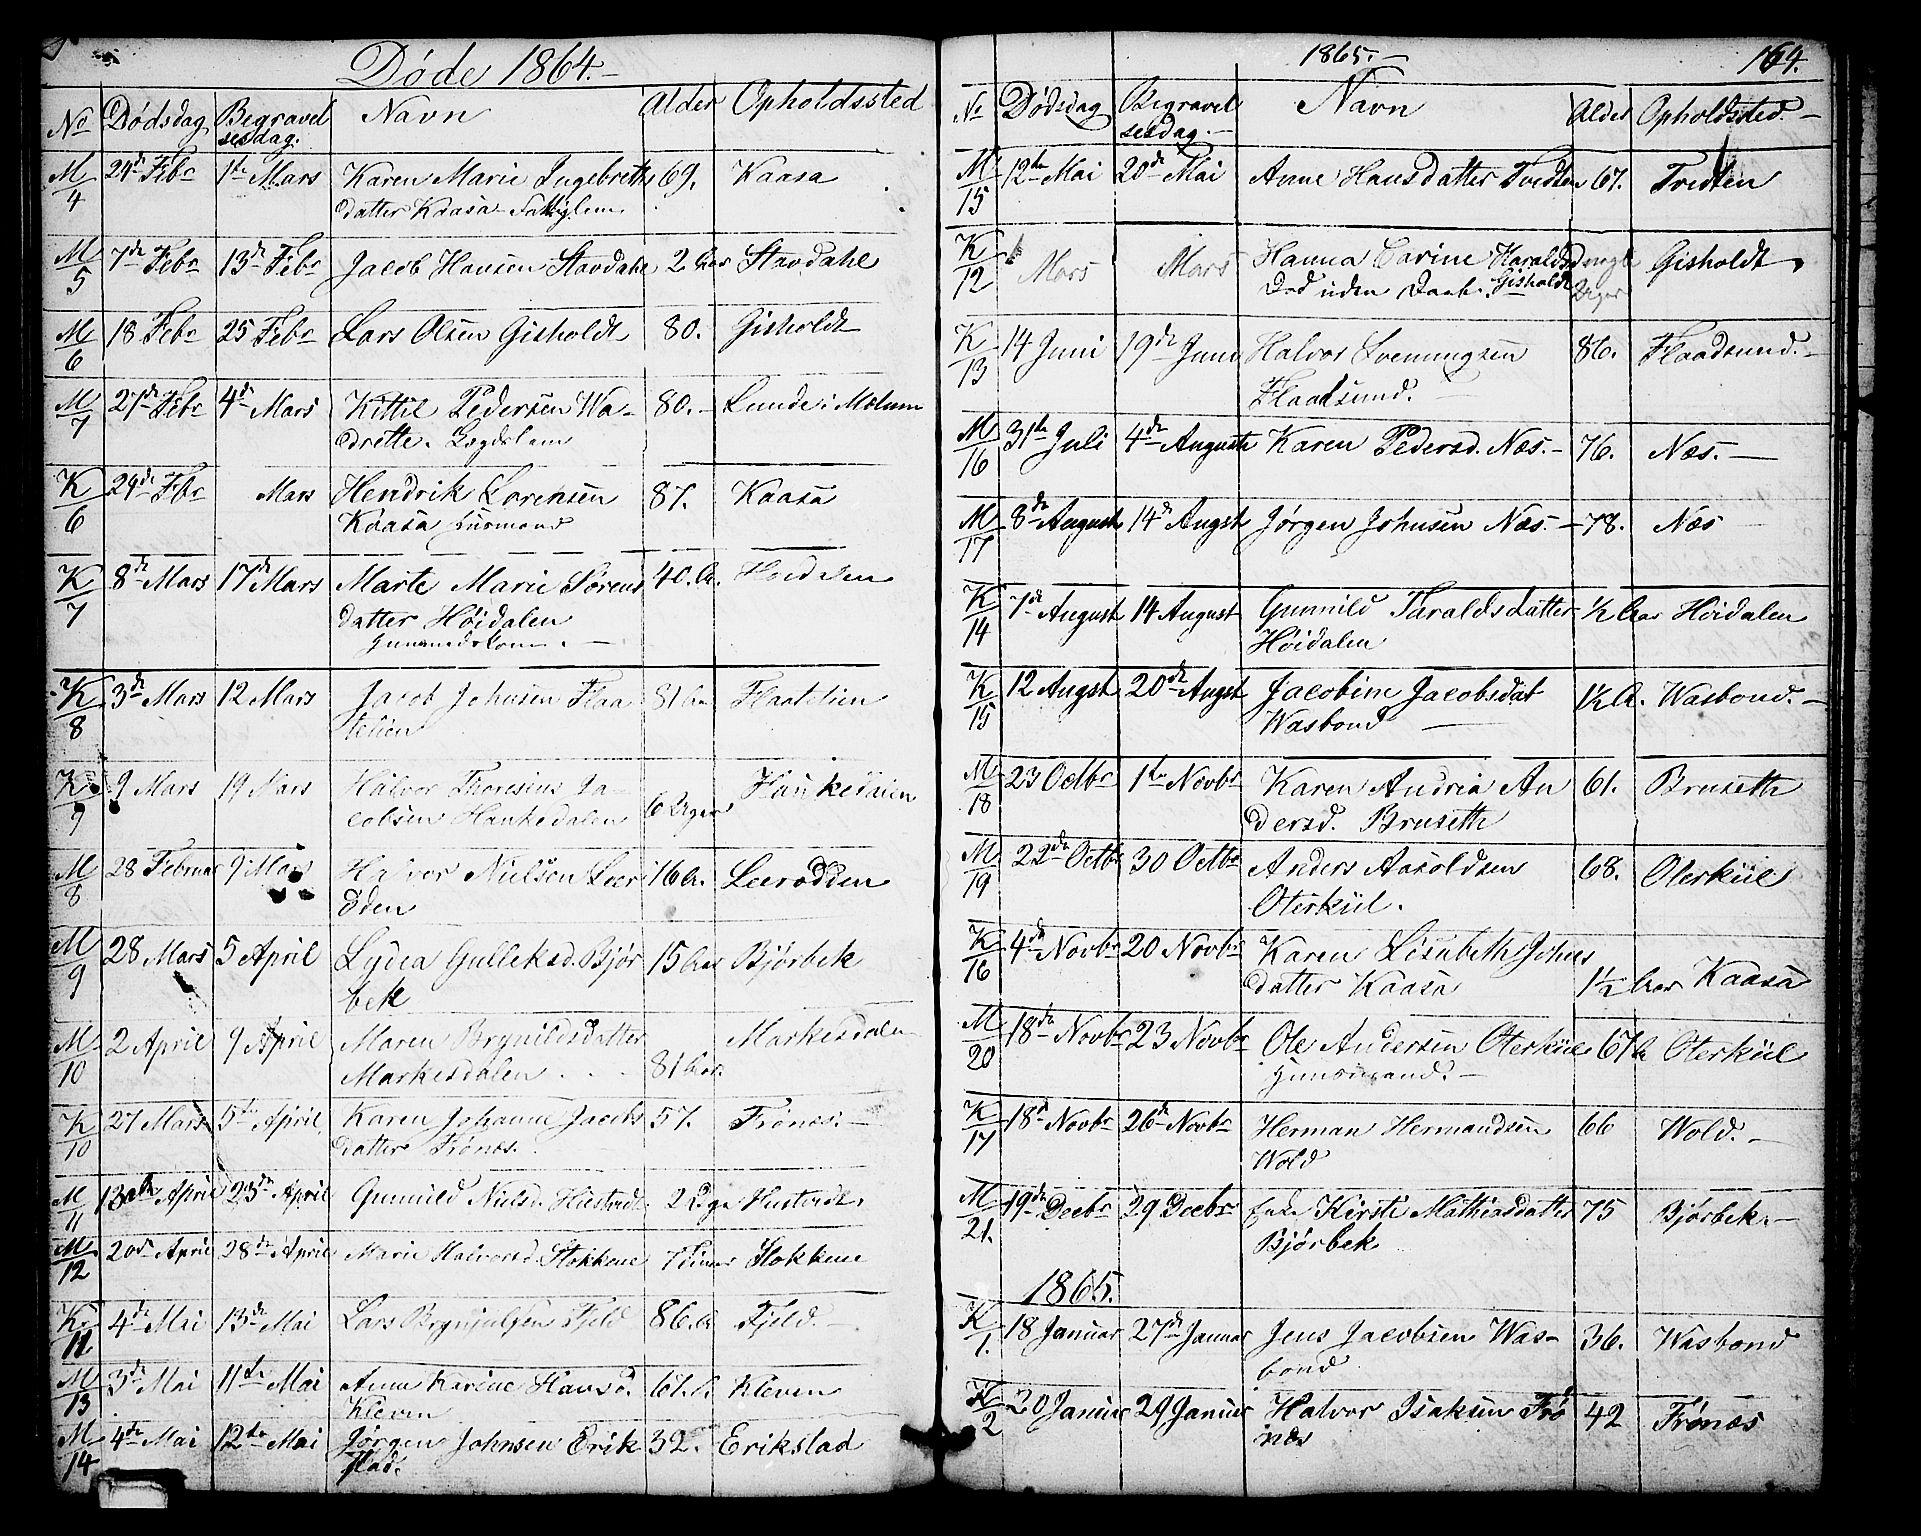 SAKO, Solum kirkebøker, G/Gb/L0002: Klokkerbok nr. II 2, 1859-1879, s. 164